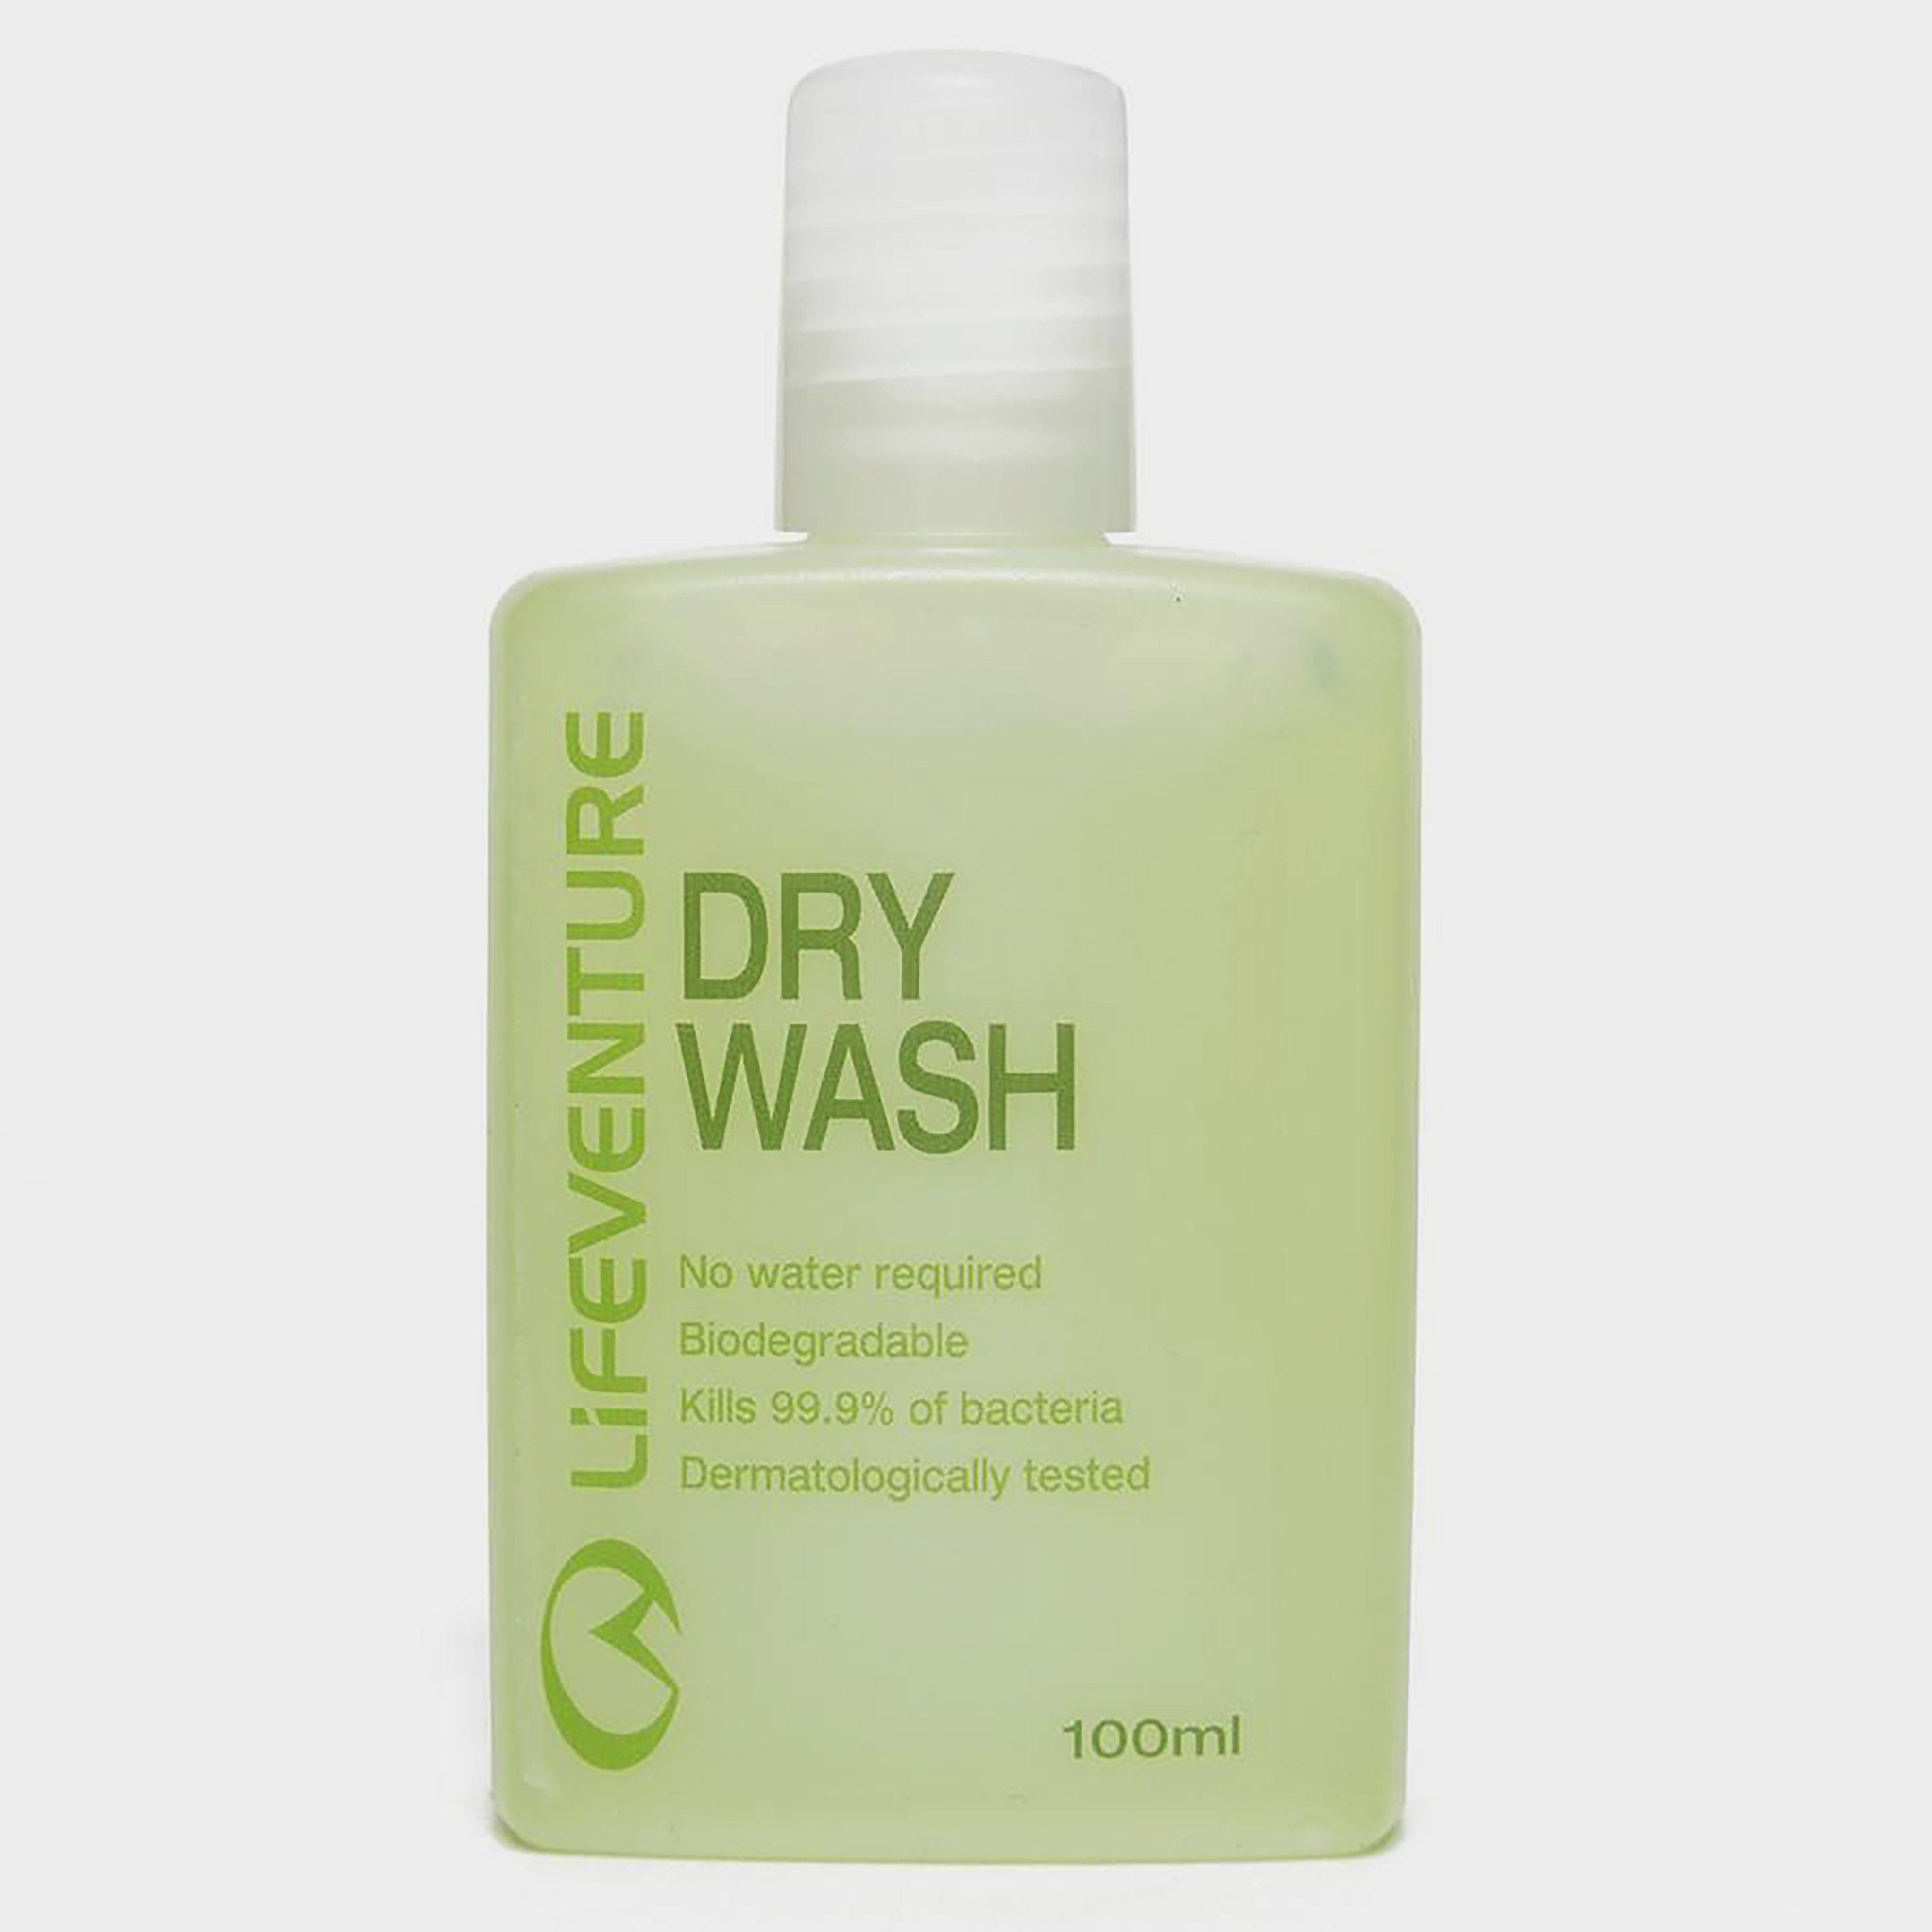 Lifeventure Dry Wash 100ml, Assorted